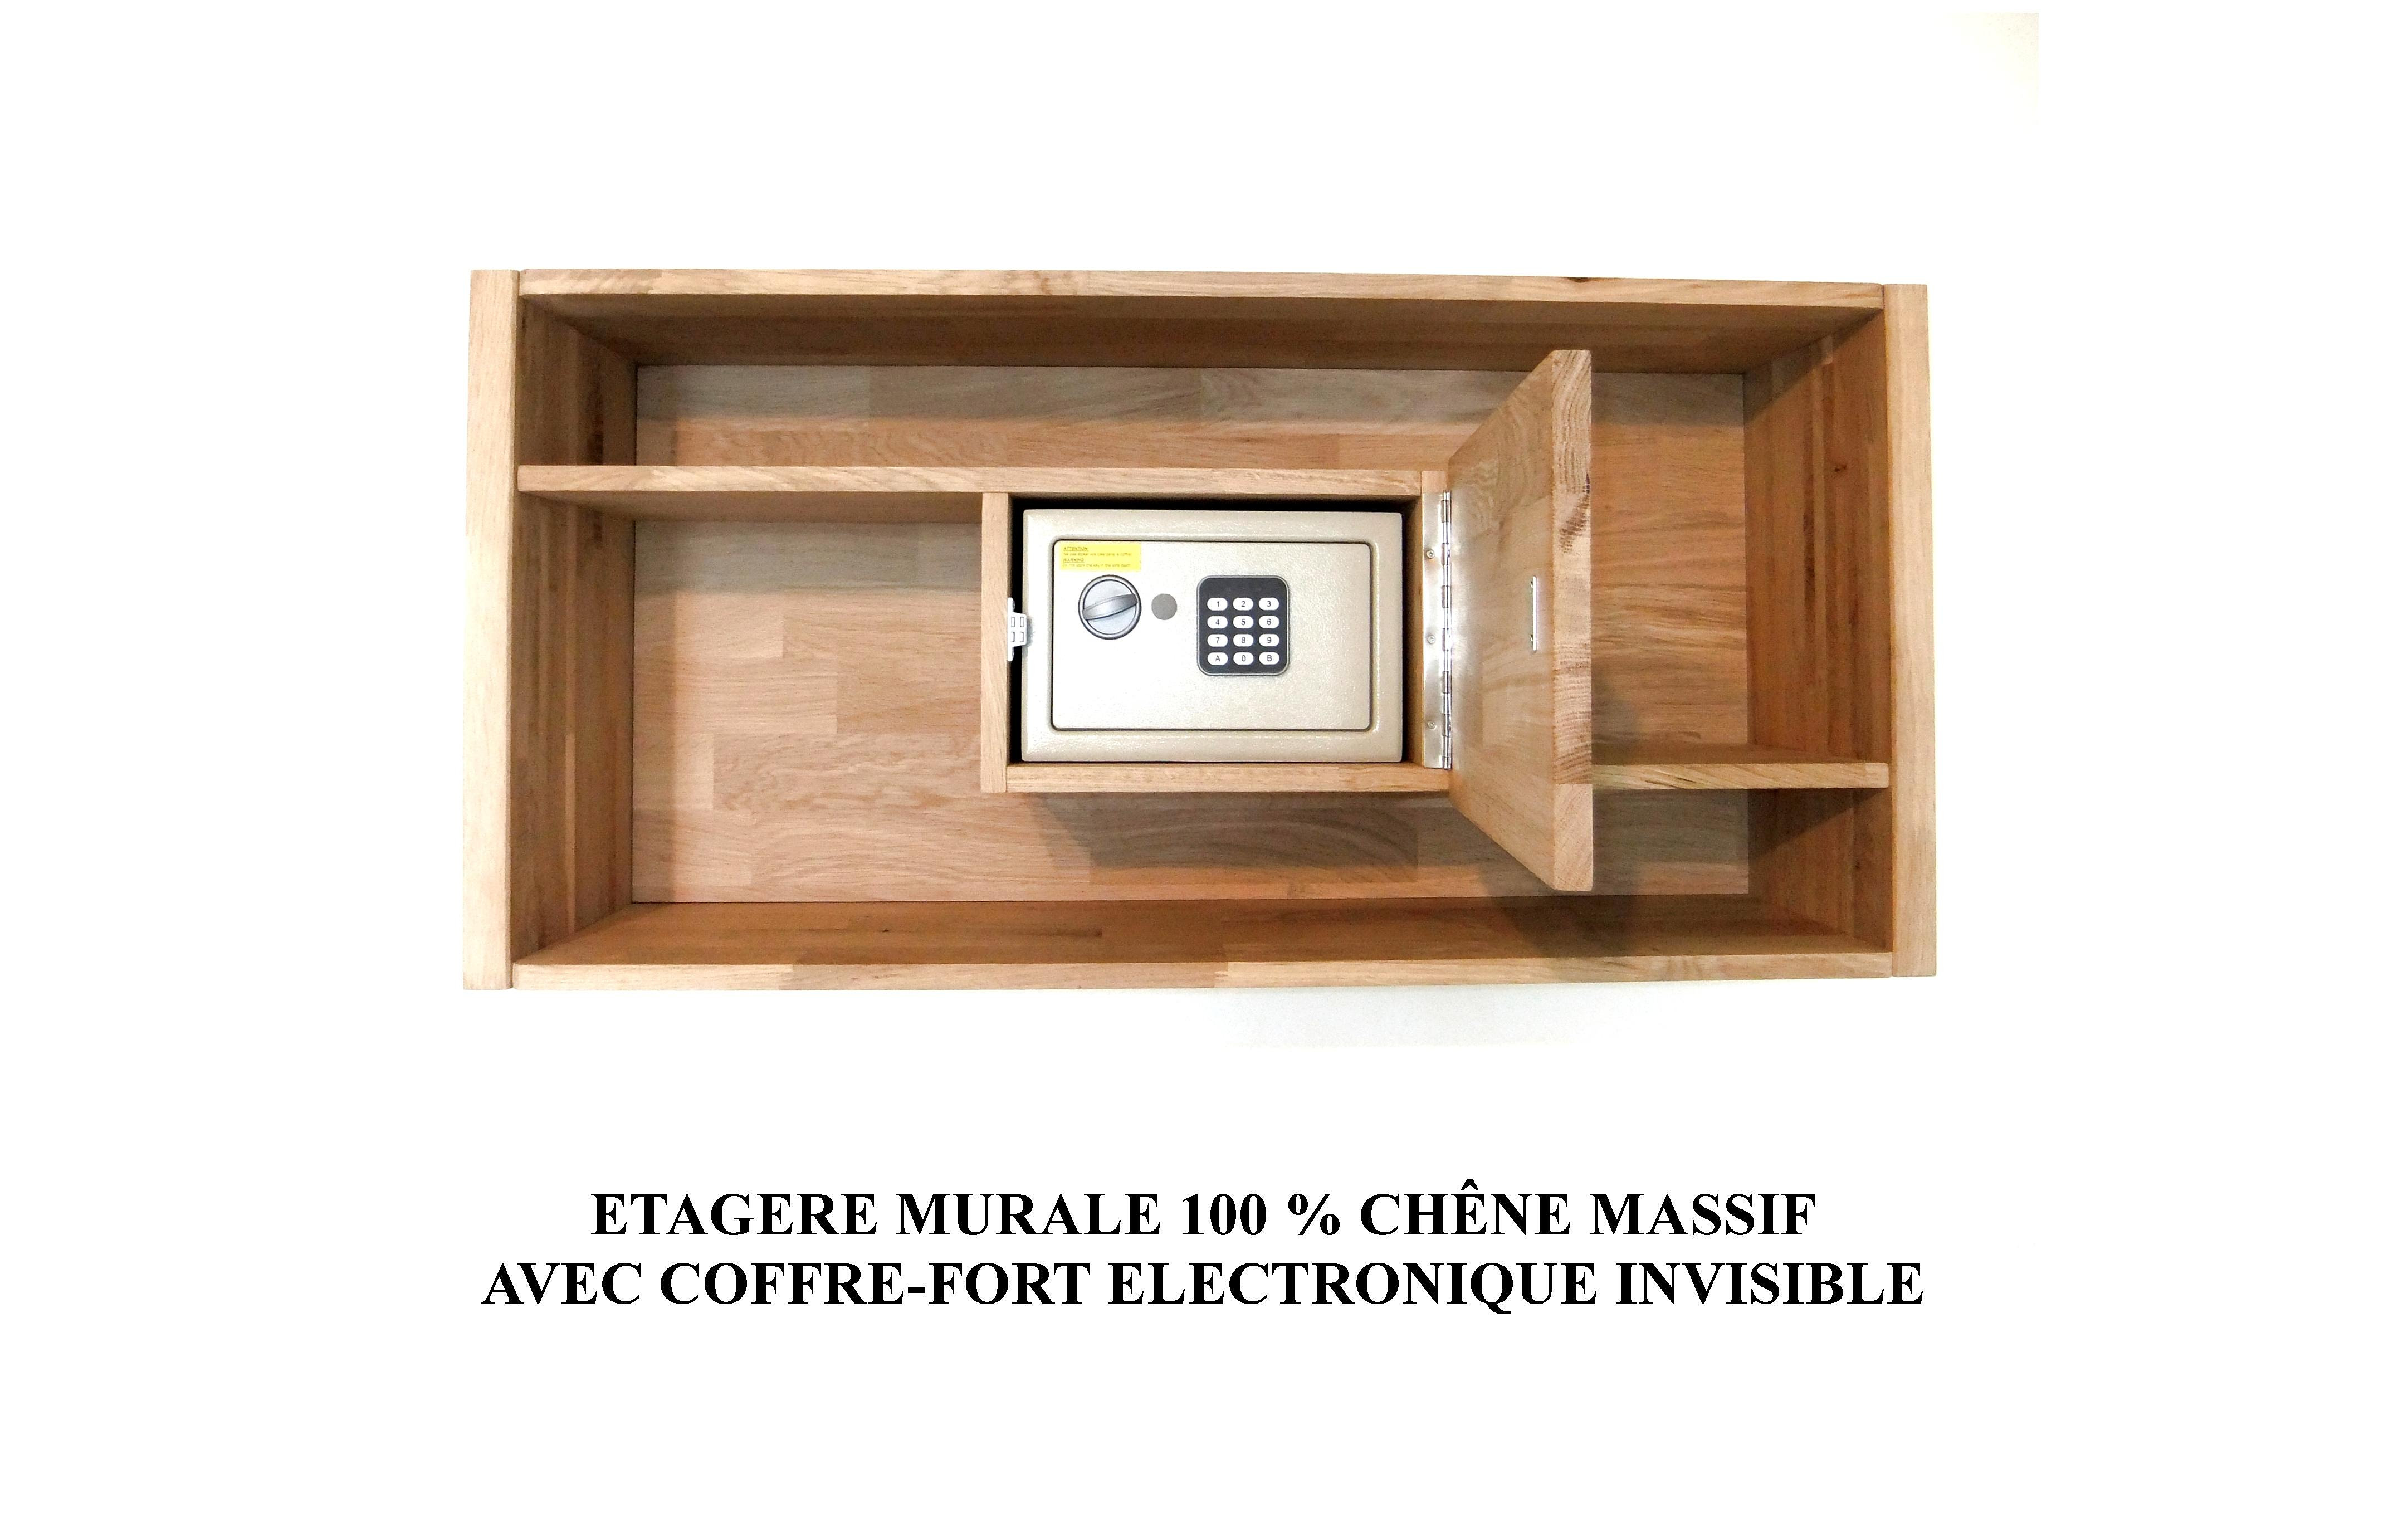 etag re murale coffre fort invisible. Black Bedroom Furniture Sets. Home Design Ideas